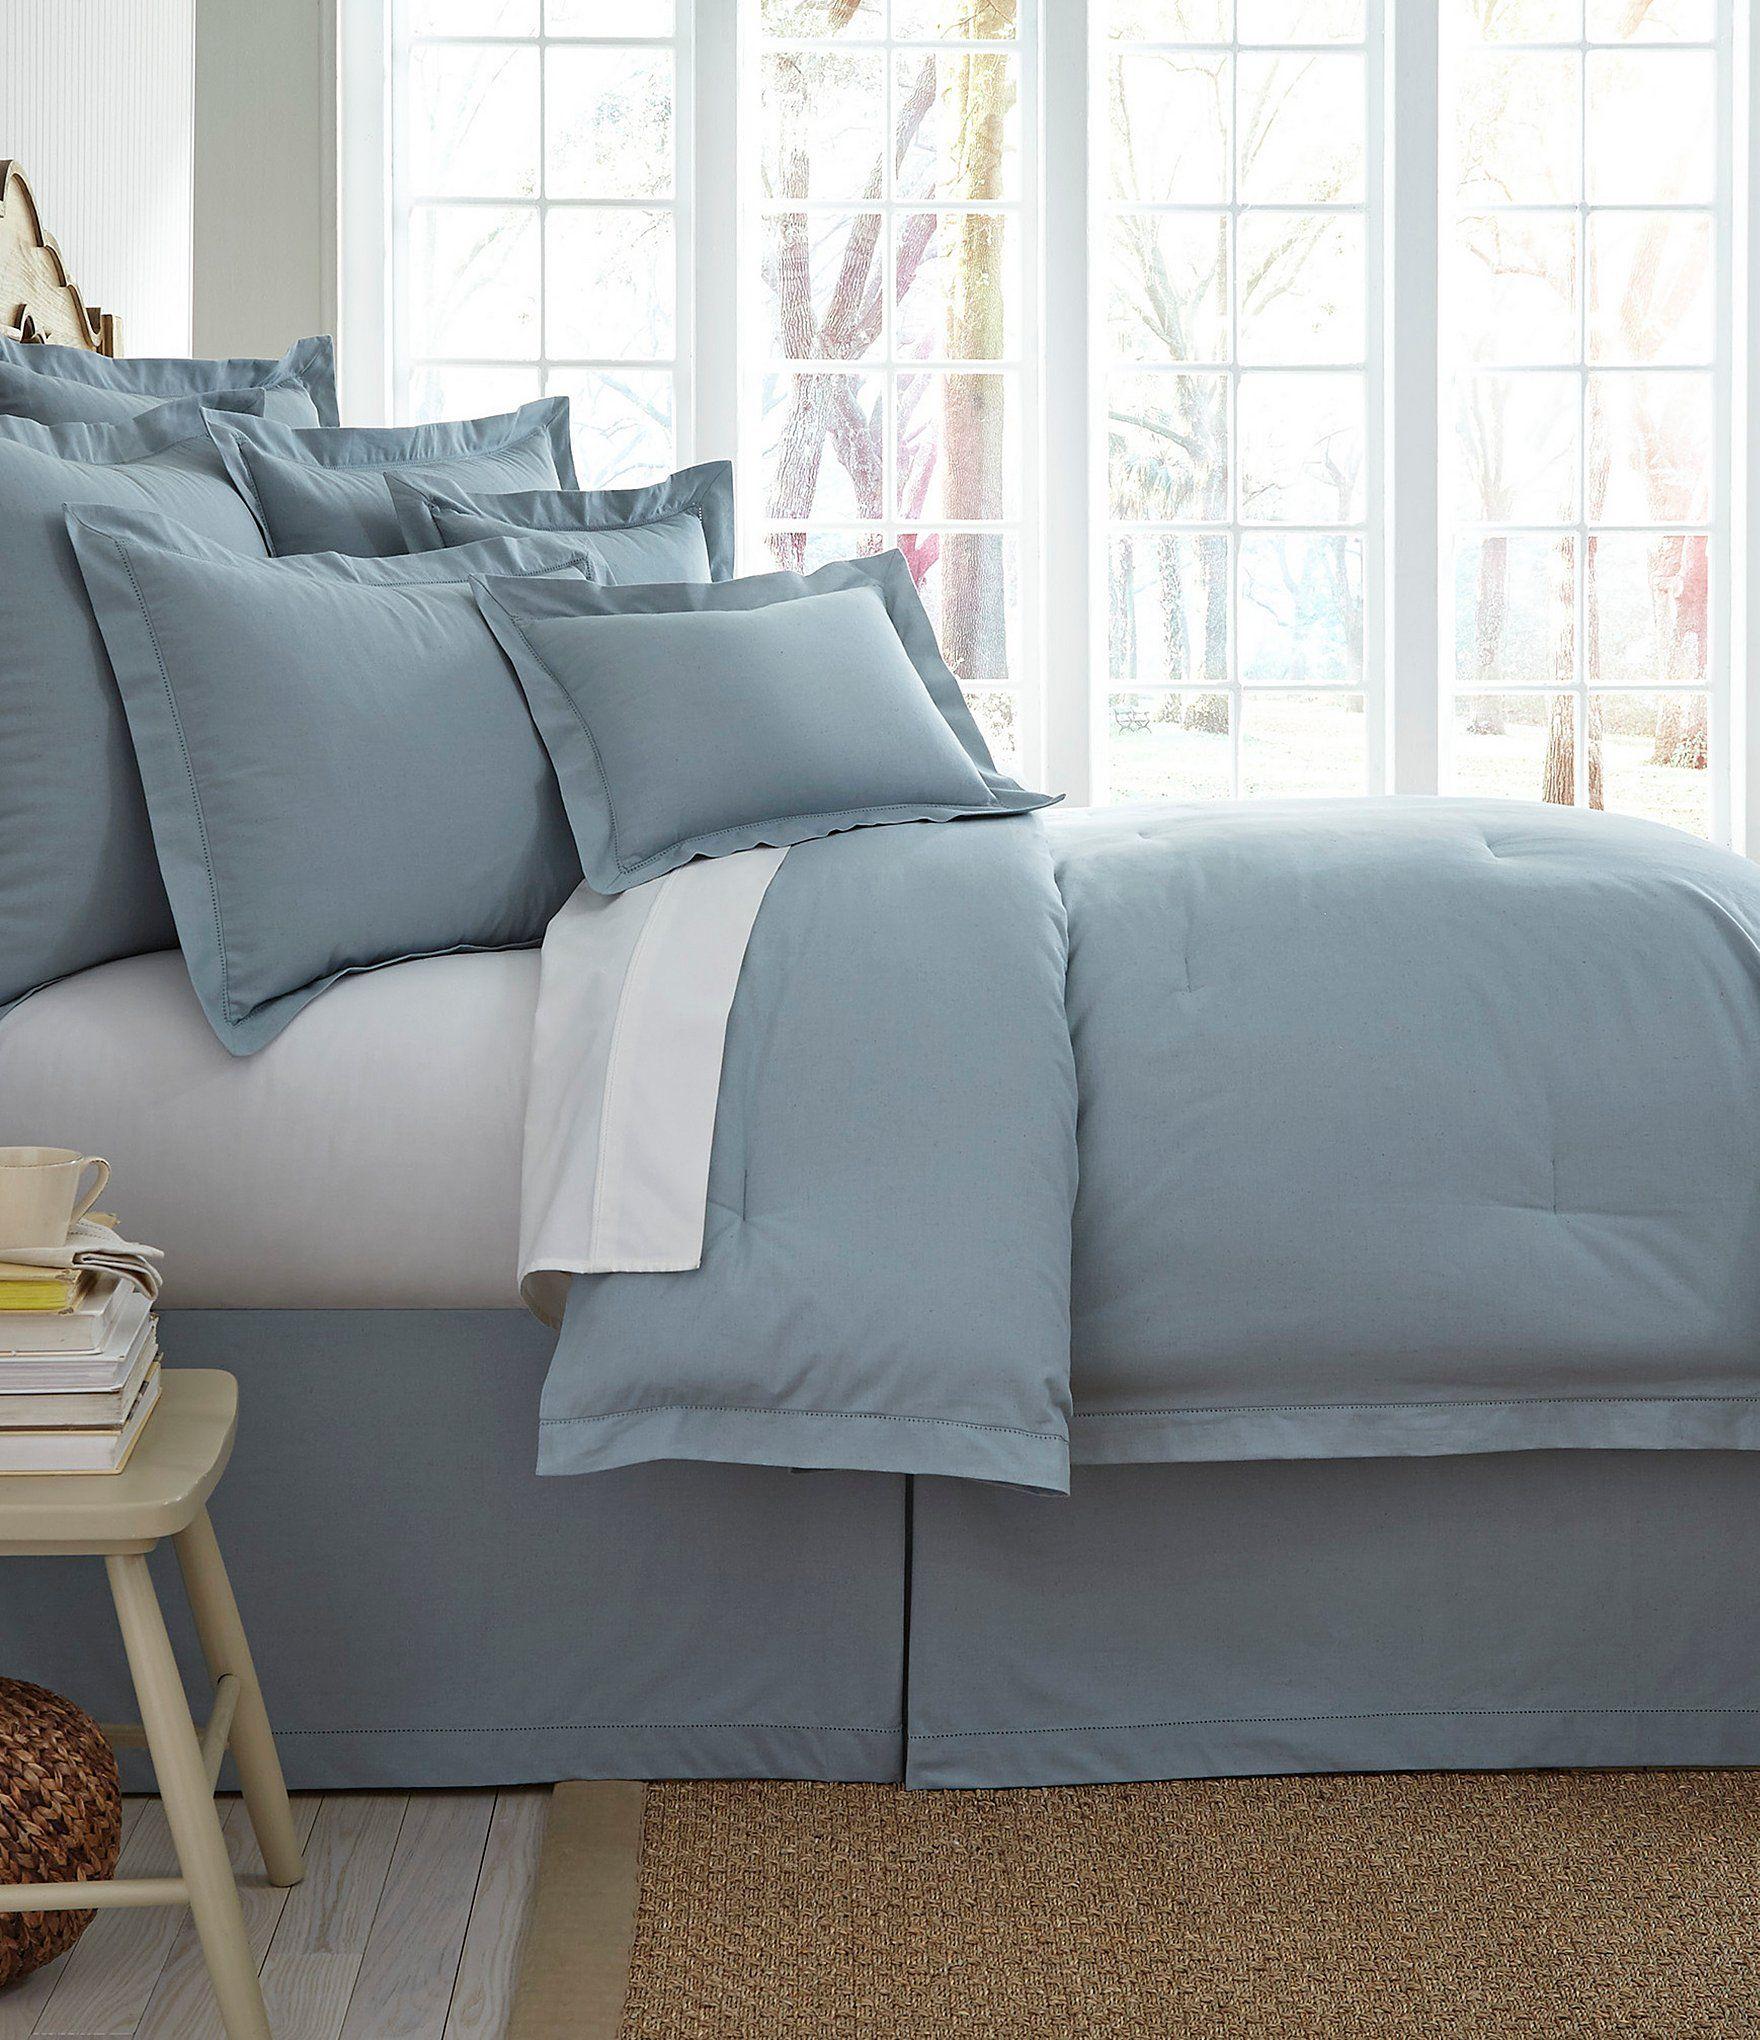 Dillards Home Decor: Noble Excellence Villa Naturals Linen-Textured Comforter